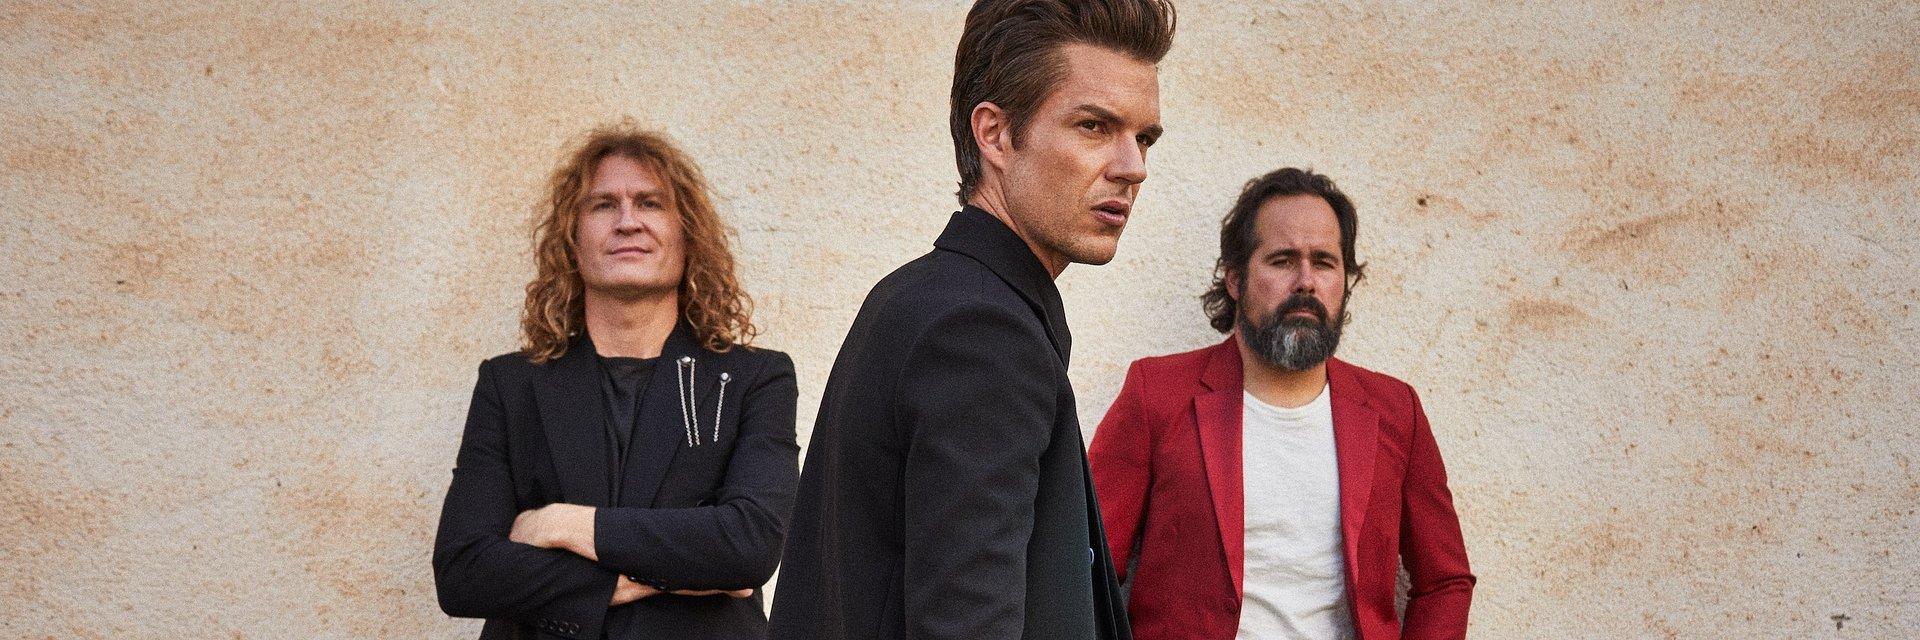 "The Killers: koncept-album ""Pressure Machine"" już dostępny"